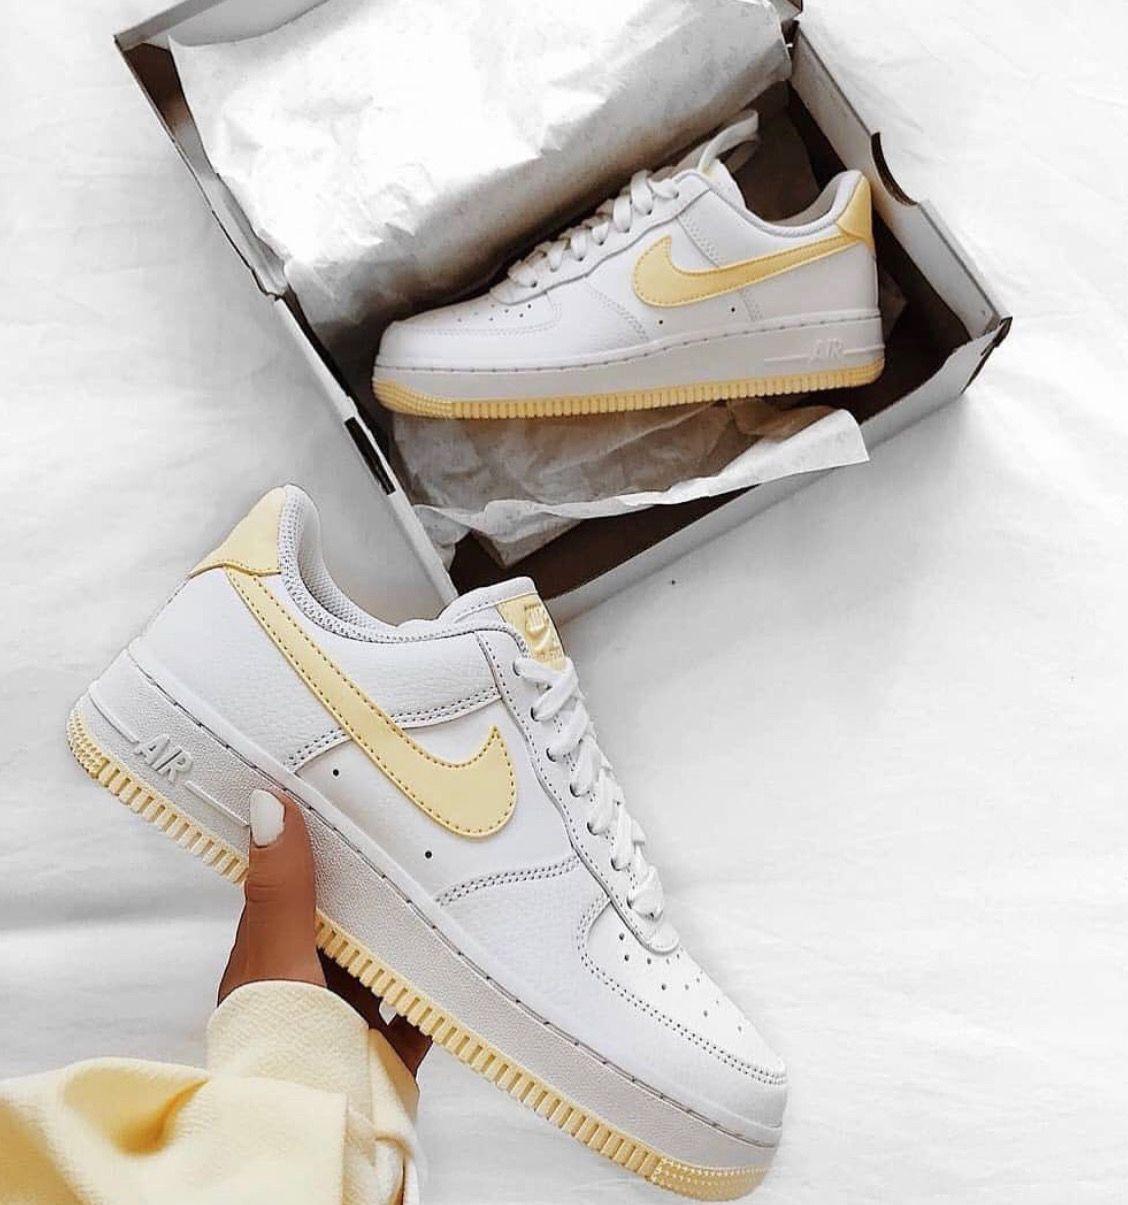 Nike schuhe flache sohle | Flache sohle schuhe online einkaufen